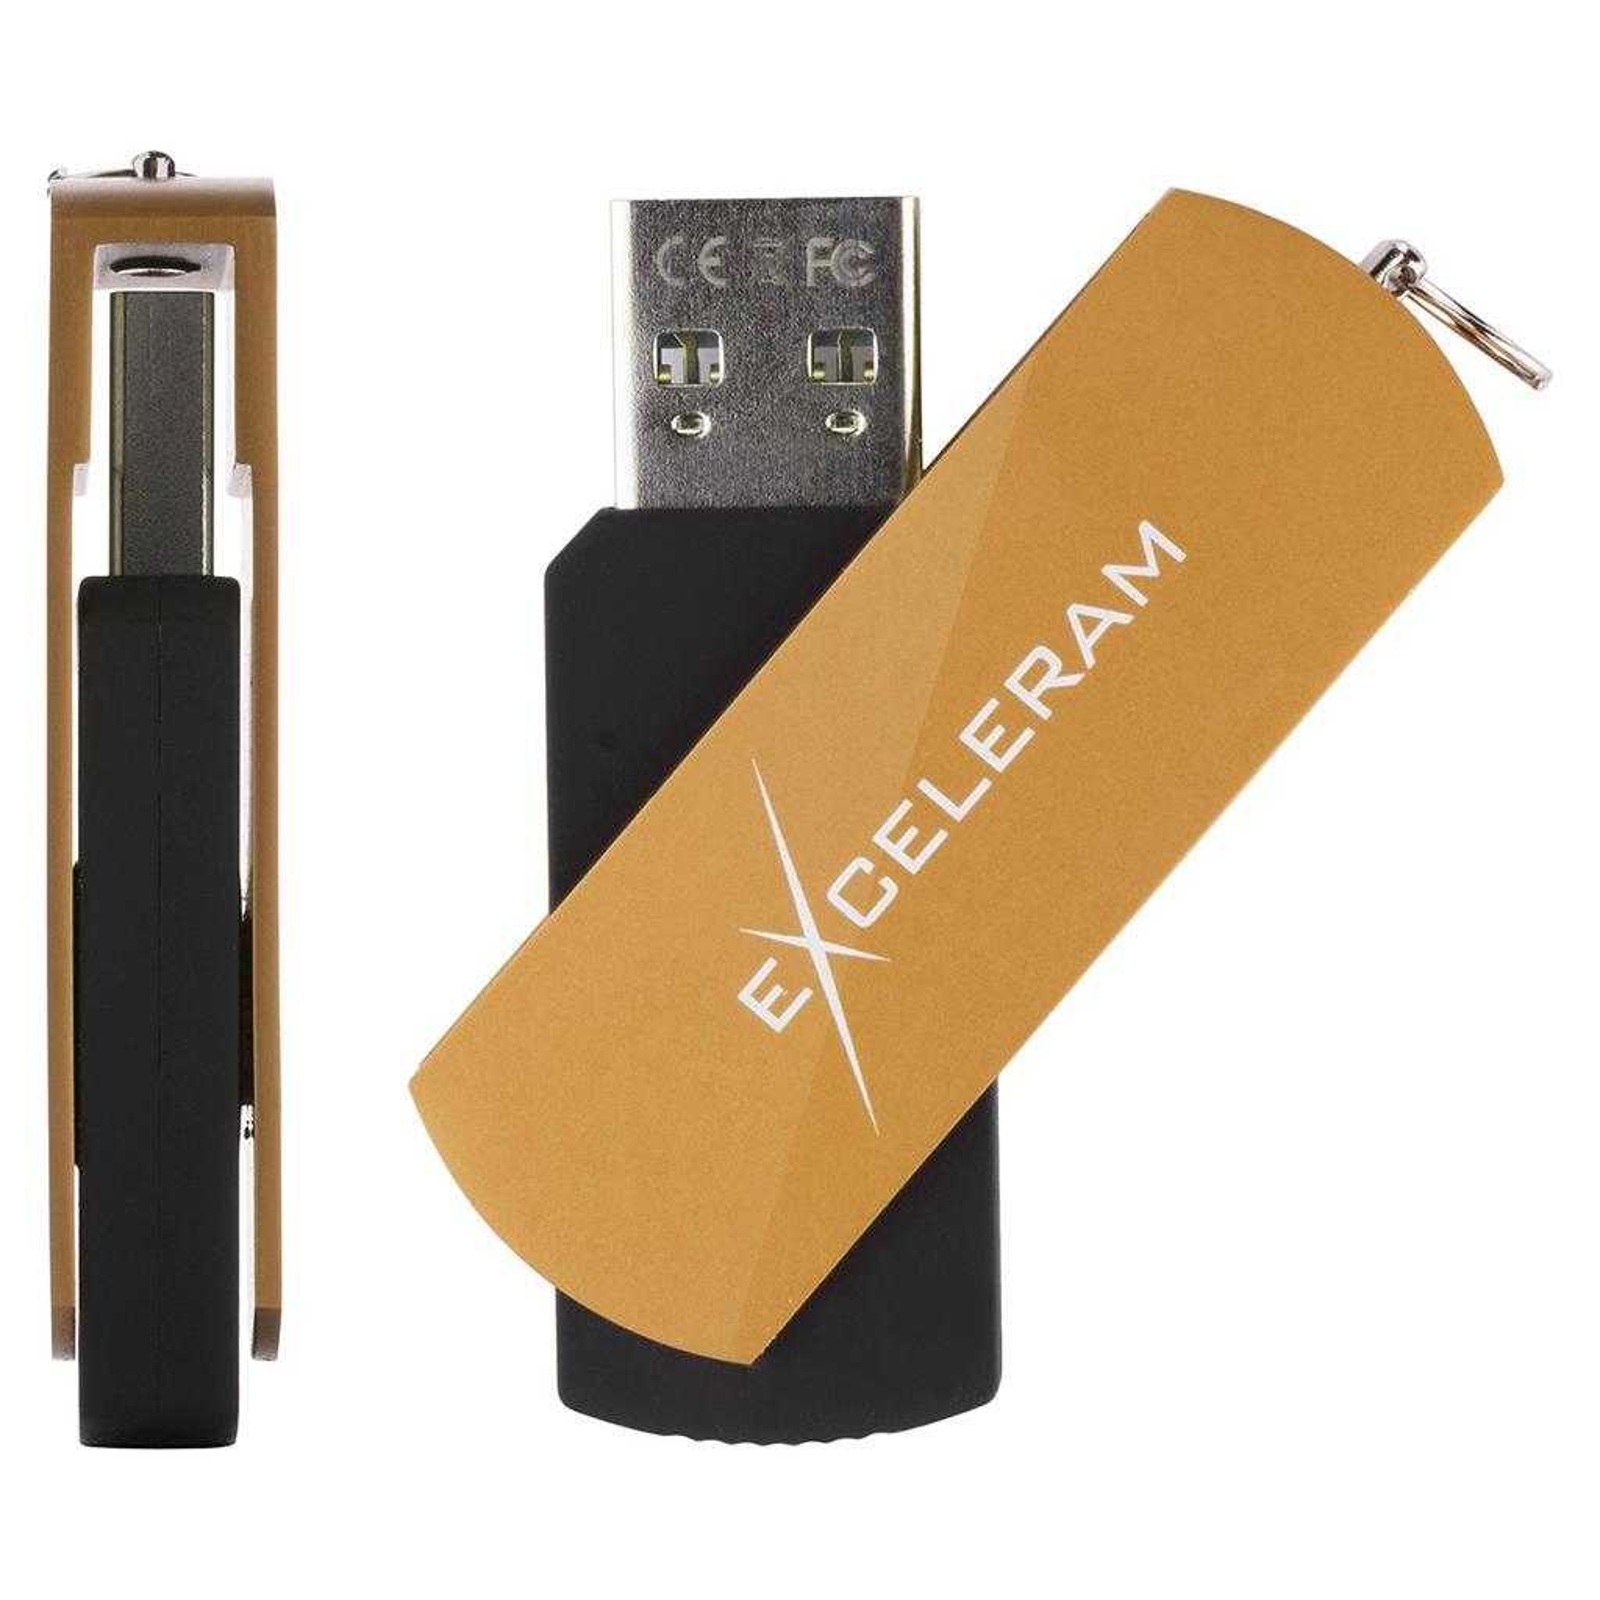 USB флеш накопитель eXceleram 64GB P2 Series Red/Black USB 2.0 (EXP2U2REB64) изображение 4